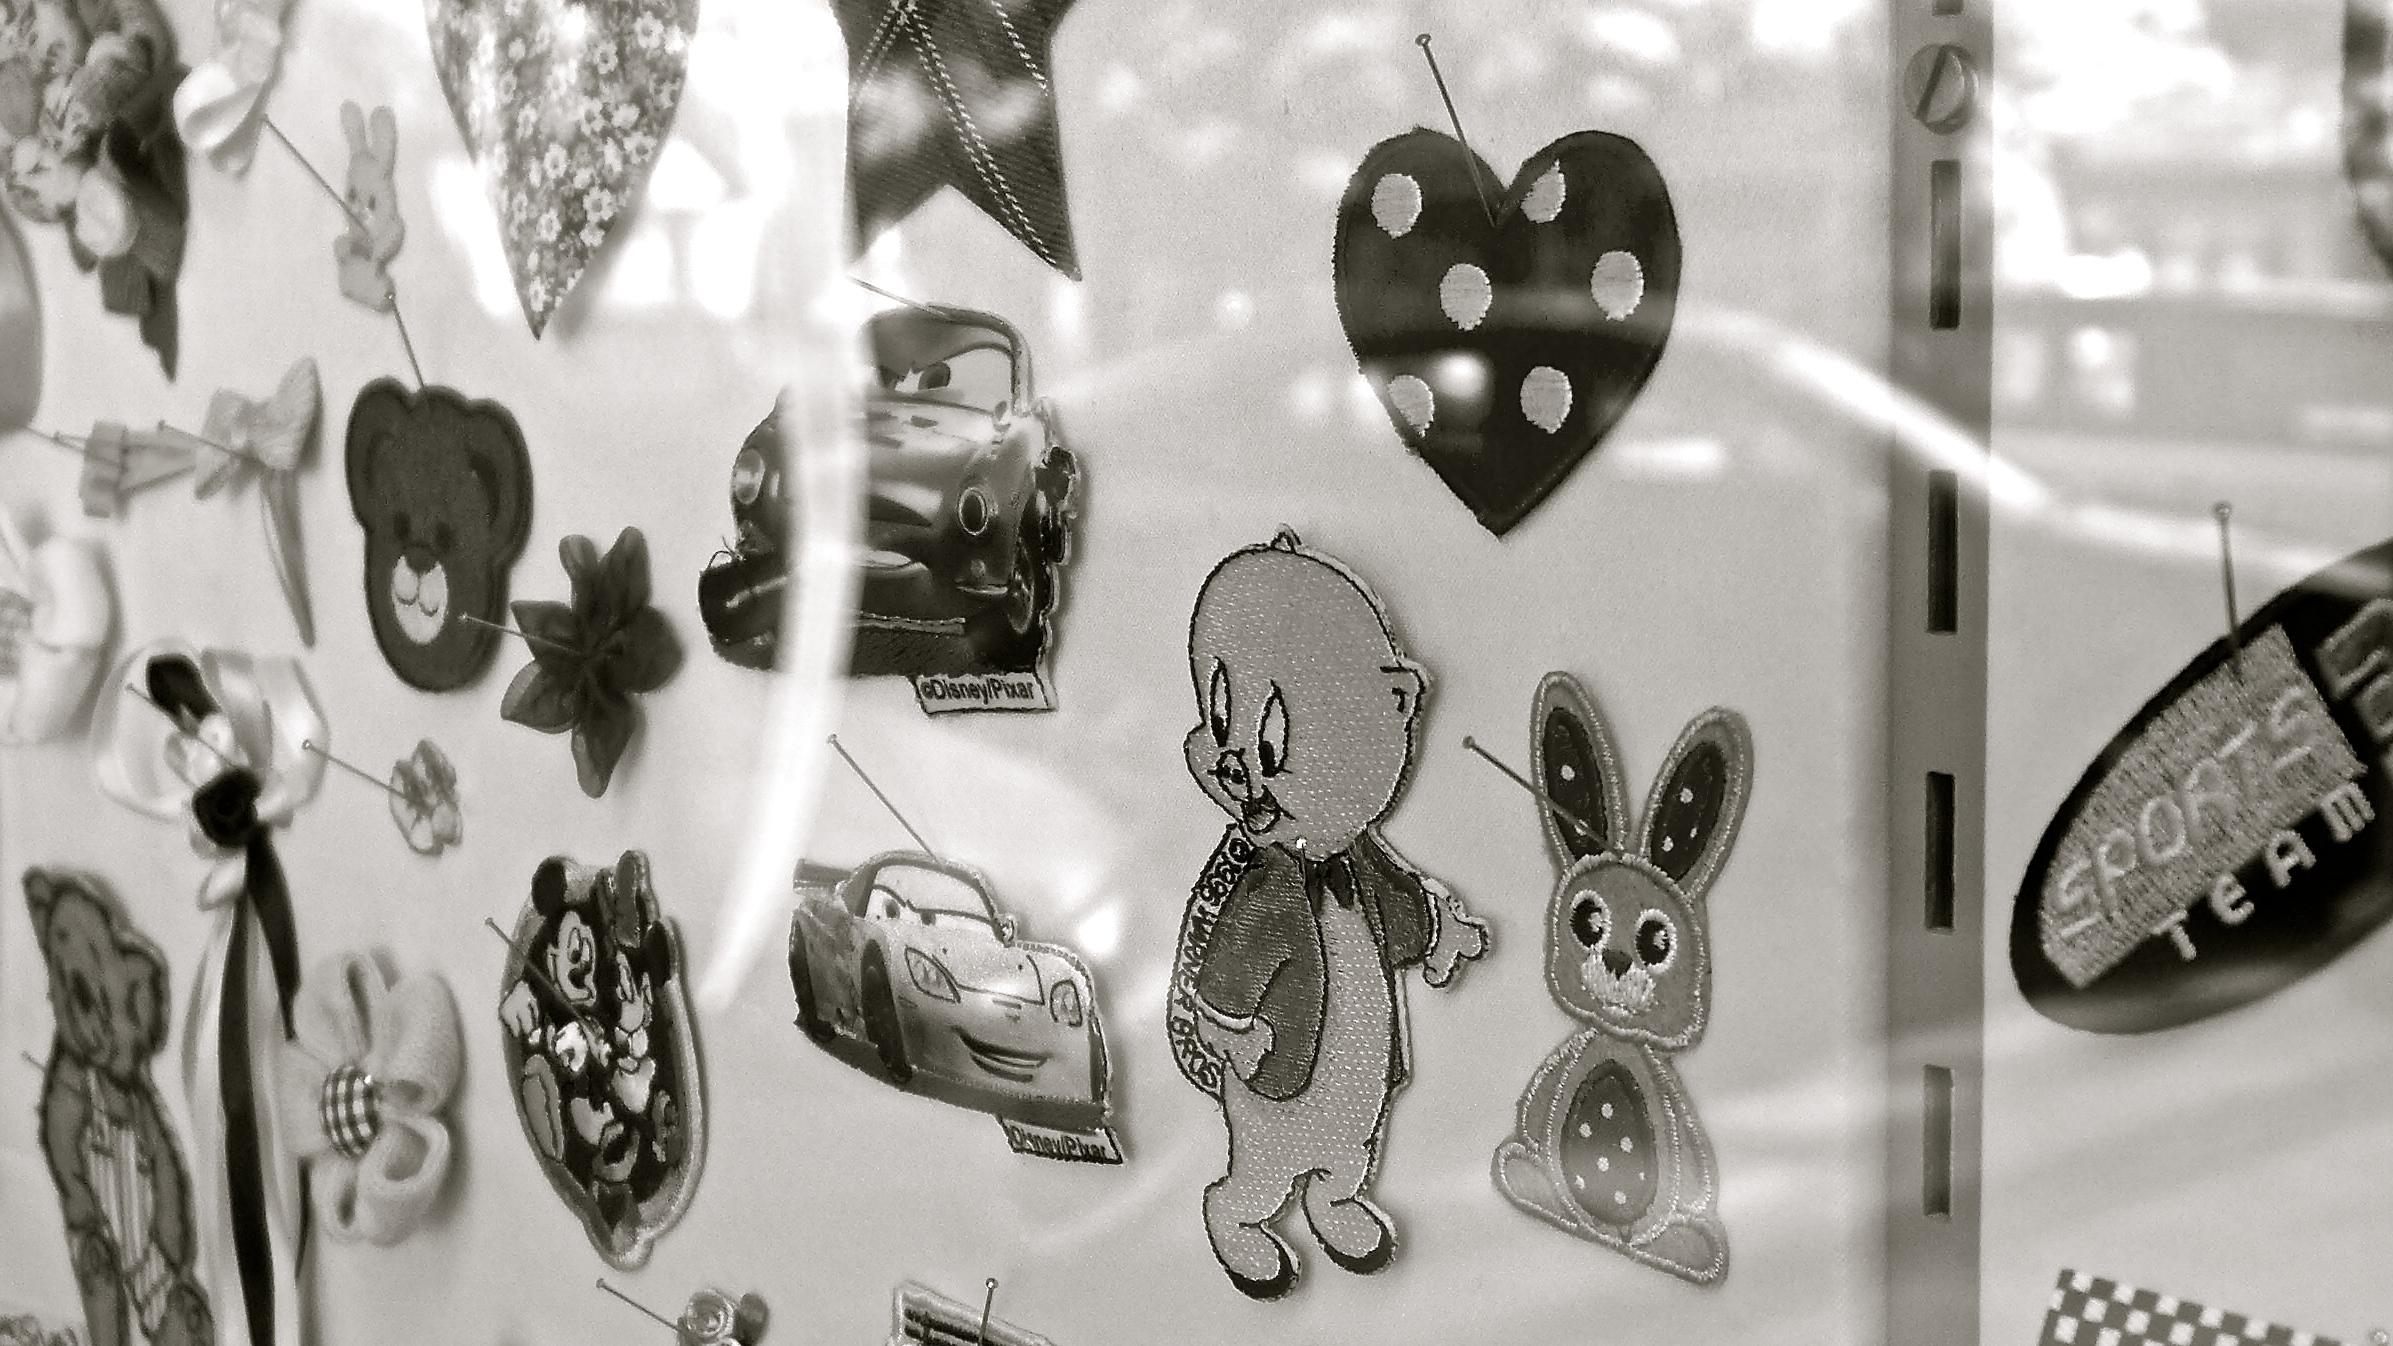 Conejo pin chado